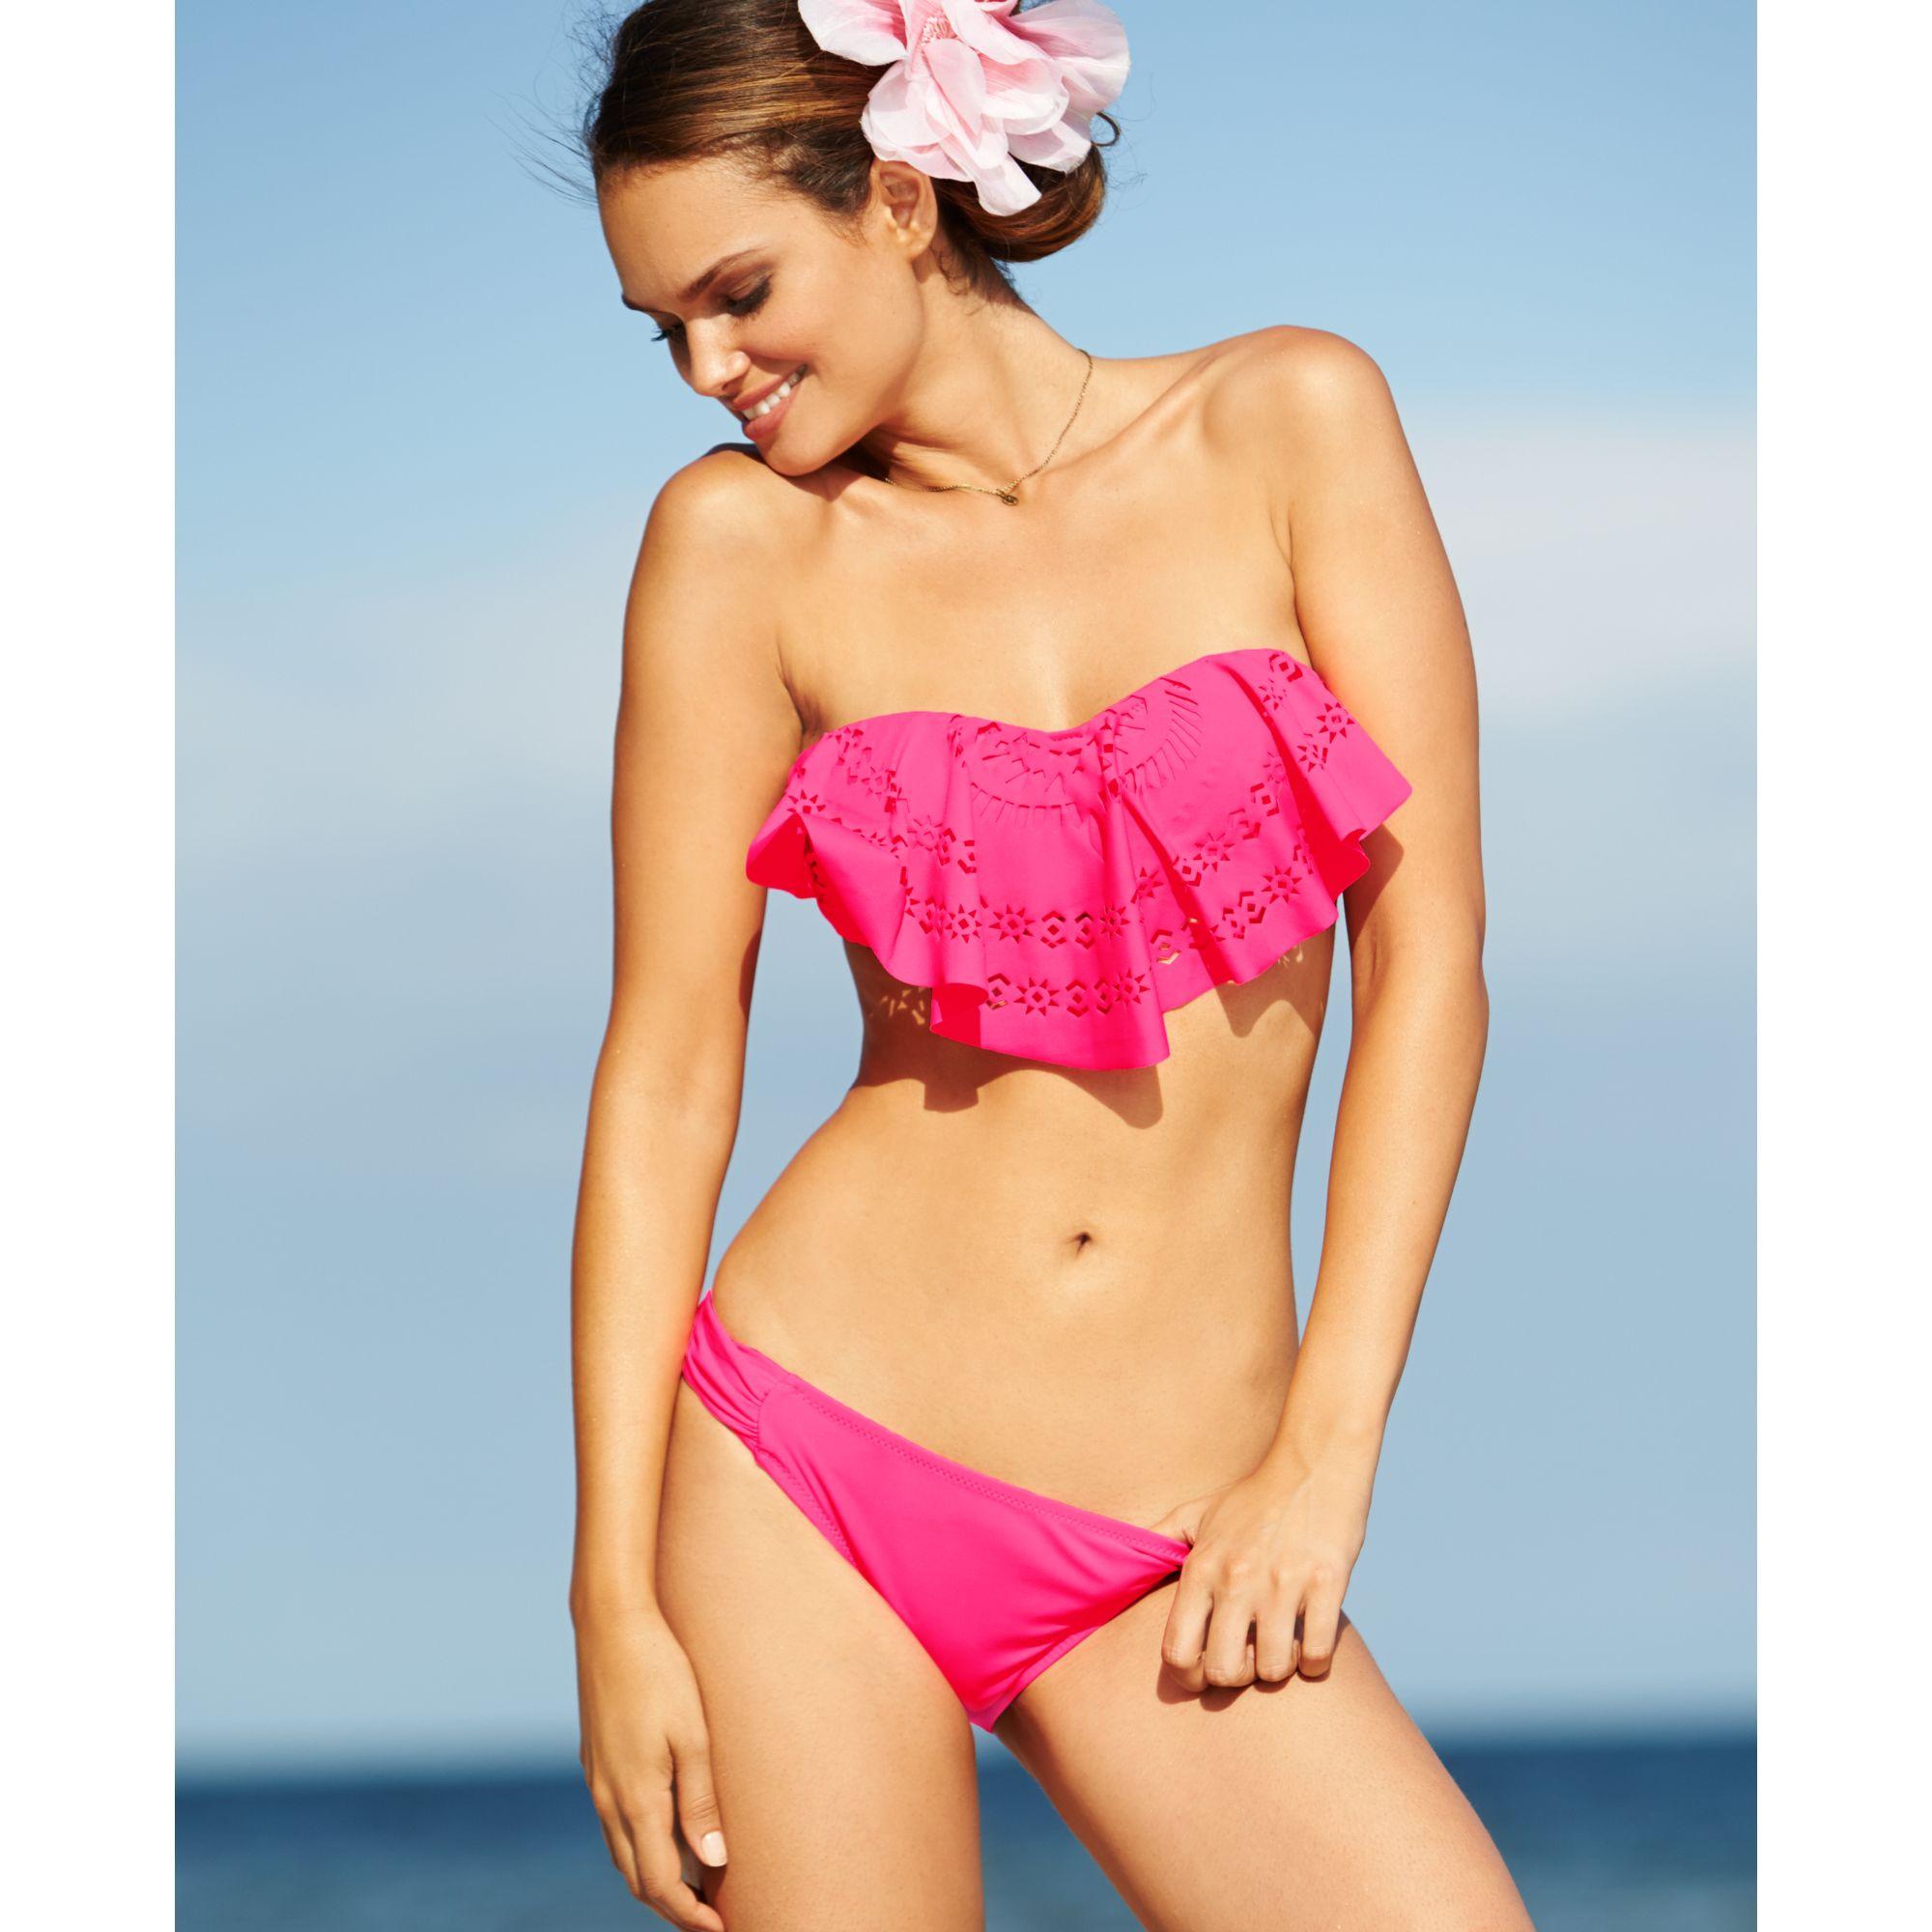 Bikini in jessica simpson